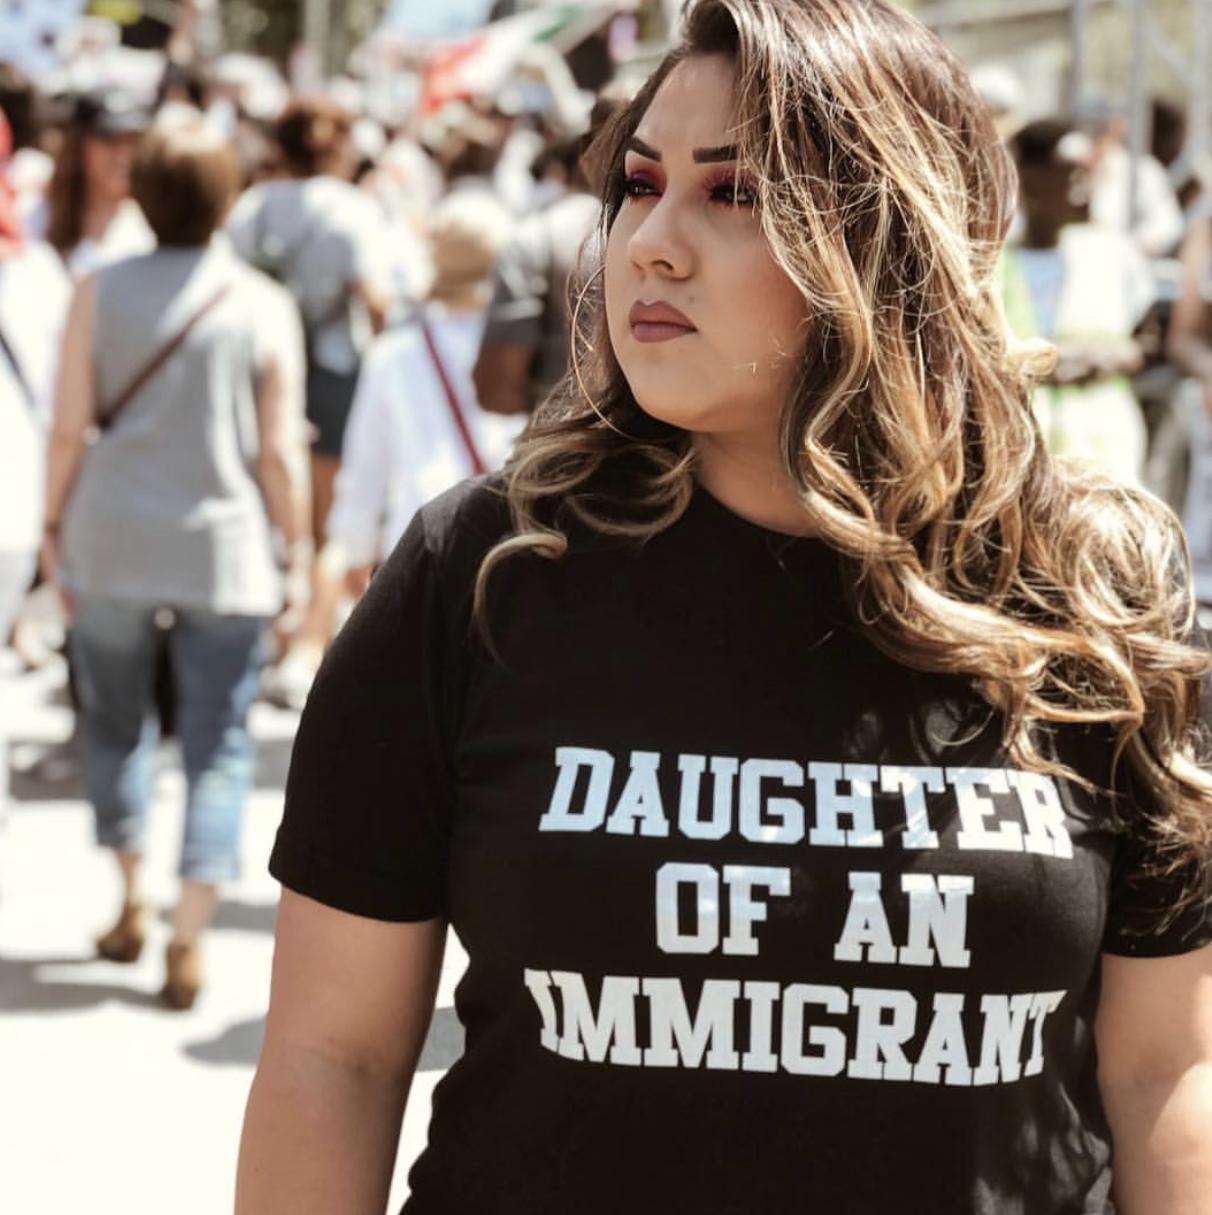 @daughterofanimmigrant via Instagram